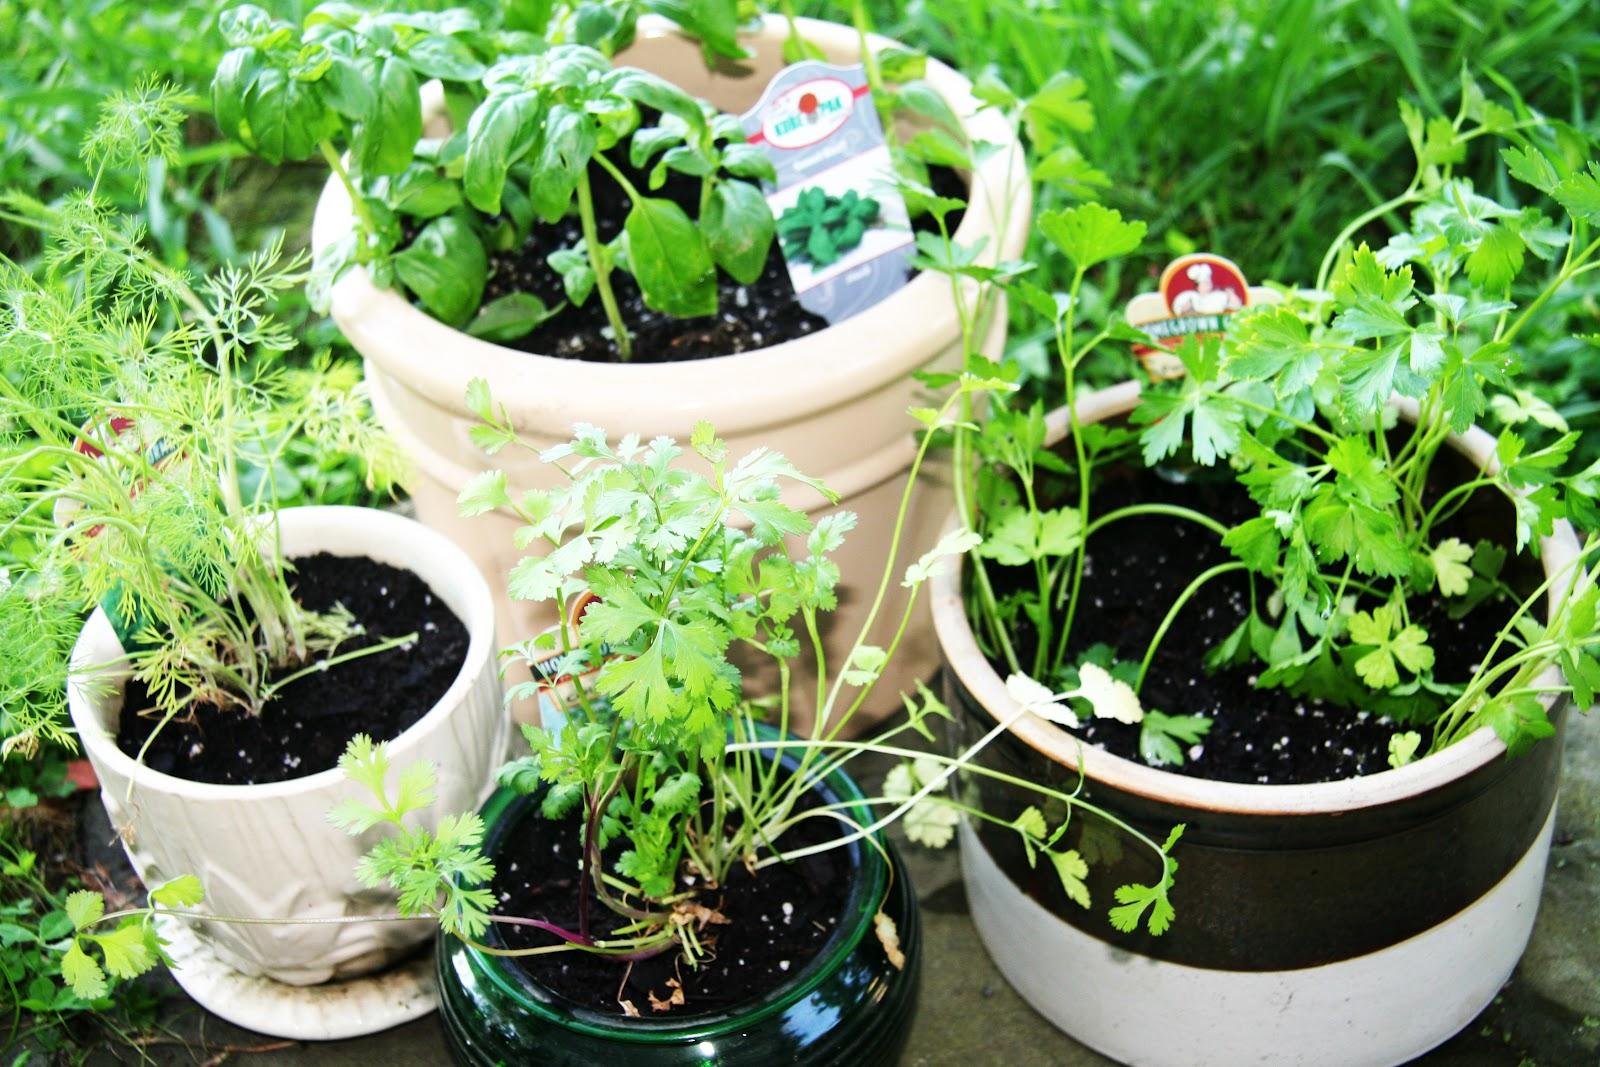 laurel bloomery girls Wikipedia:wikiproject tennessee/cleanup listing  laurel bloomery, tennessee nov 2008  girls preparatory school.